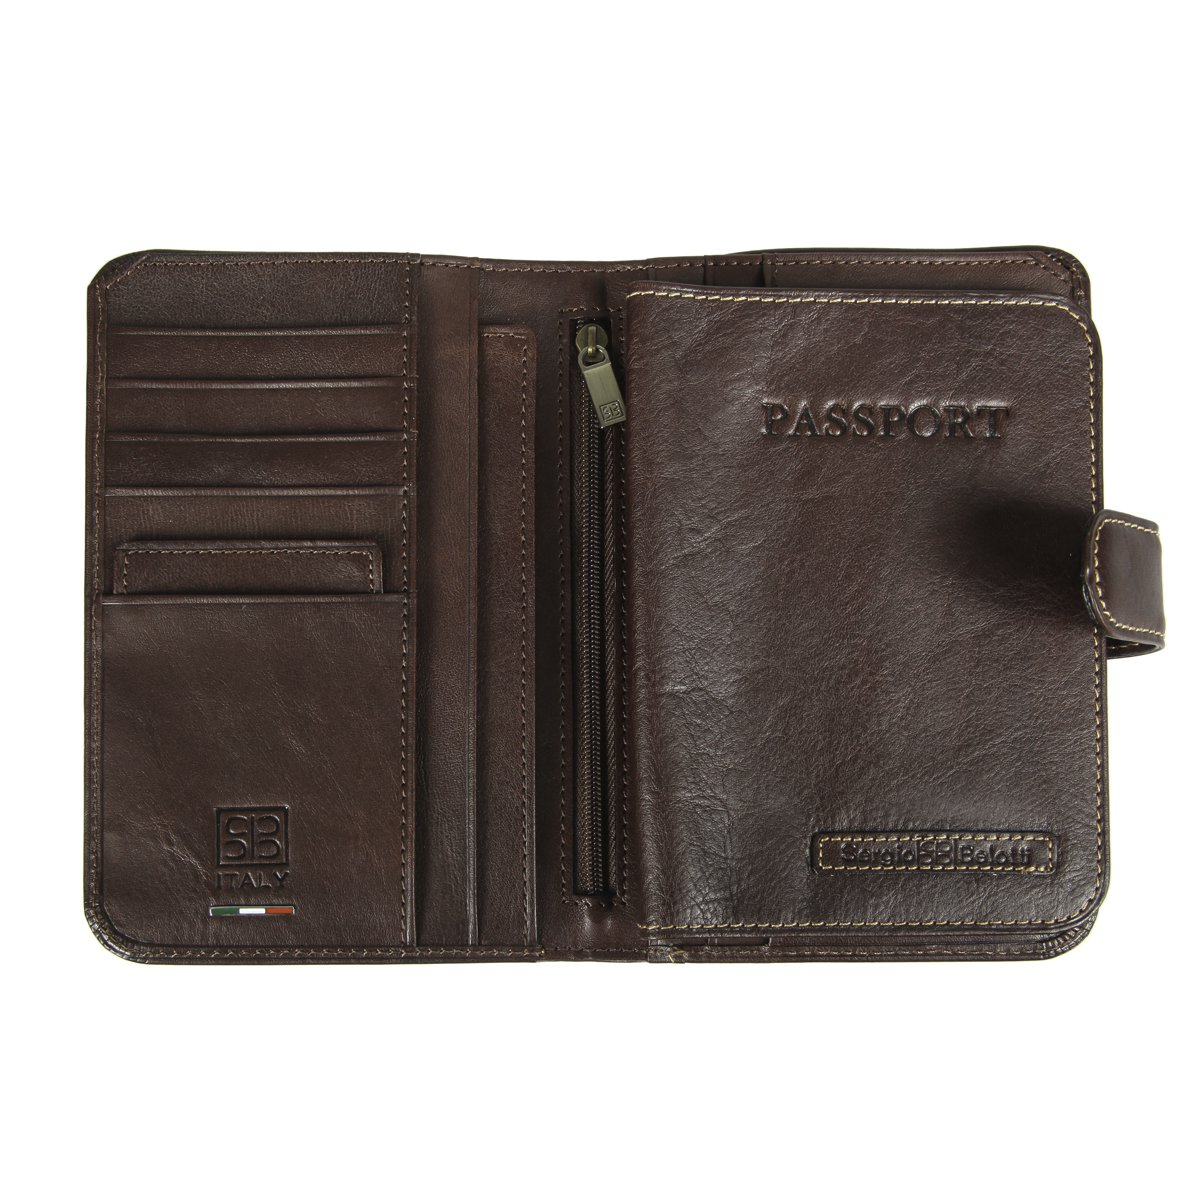 b822fc4895ac 2334 ancona brown Портмоне с обложкой для паспорта Sergio Belotti — доп.  фото №2